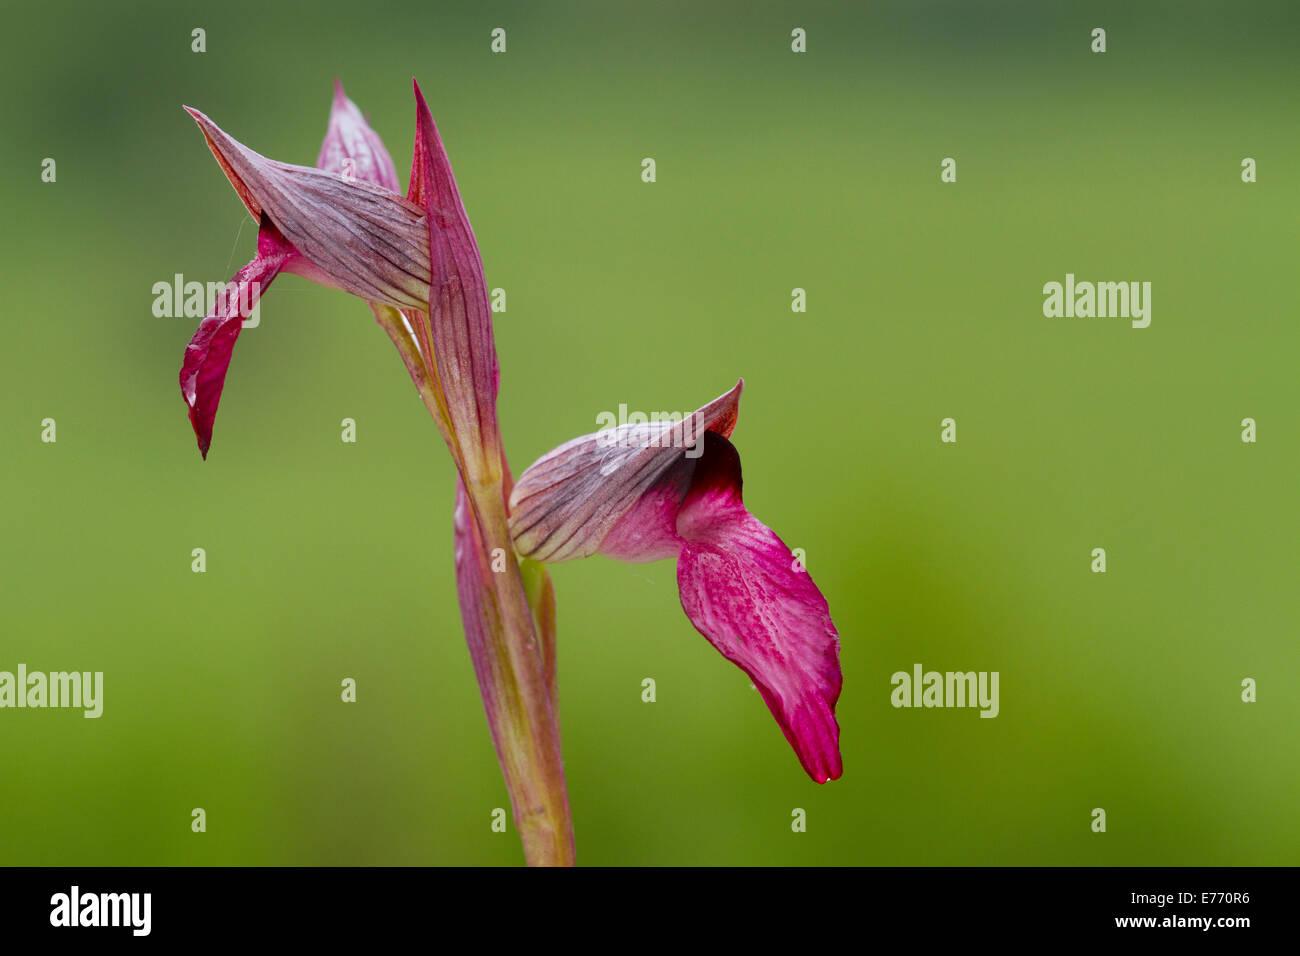 Tongue Orchid (Serapias lingua) flowering. Col de Calzan, Ariege Pyrenees, France. May. - Stock Image